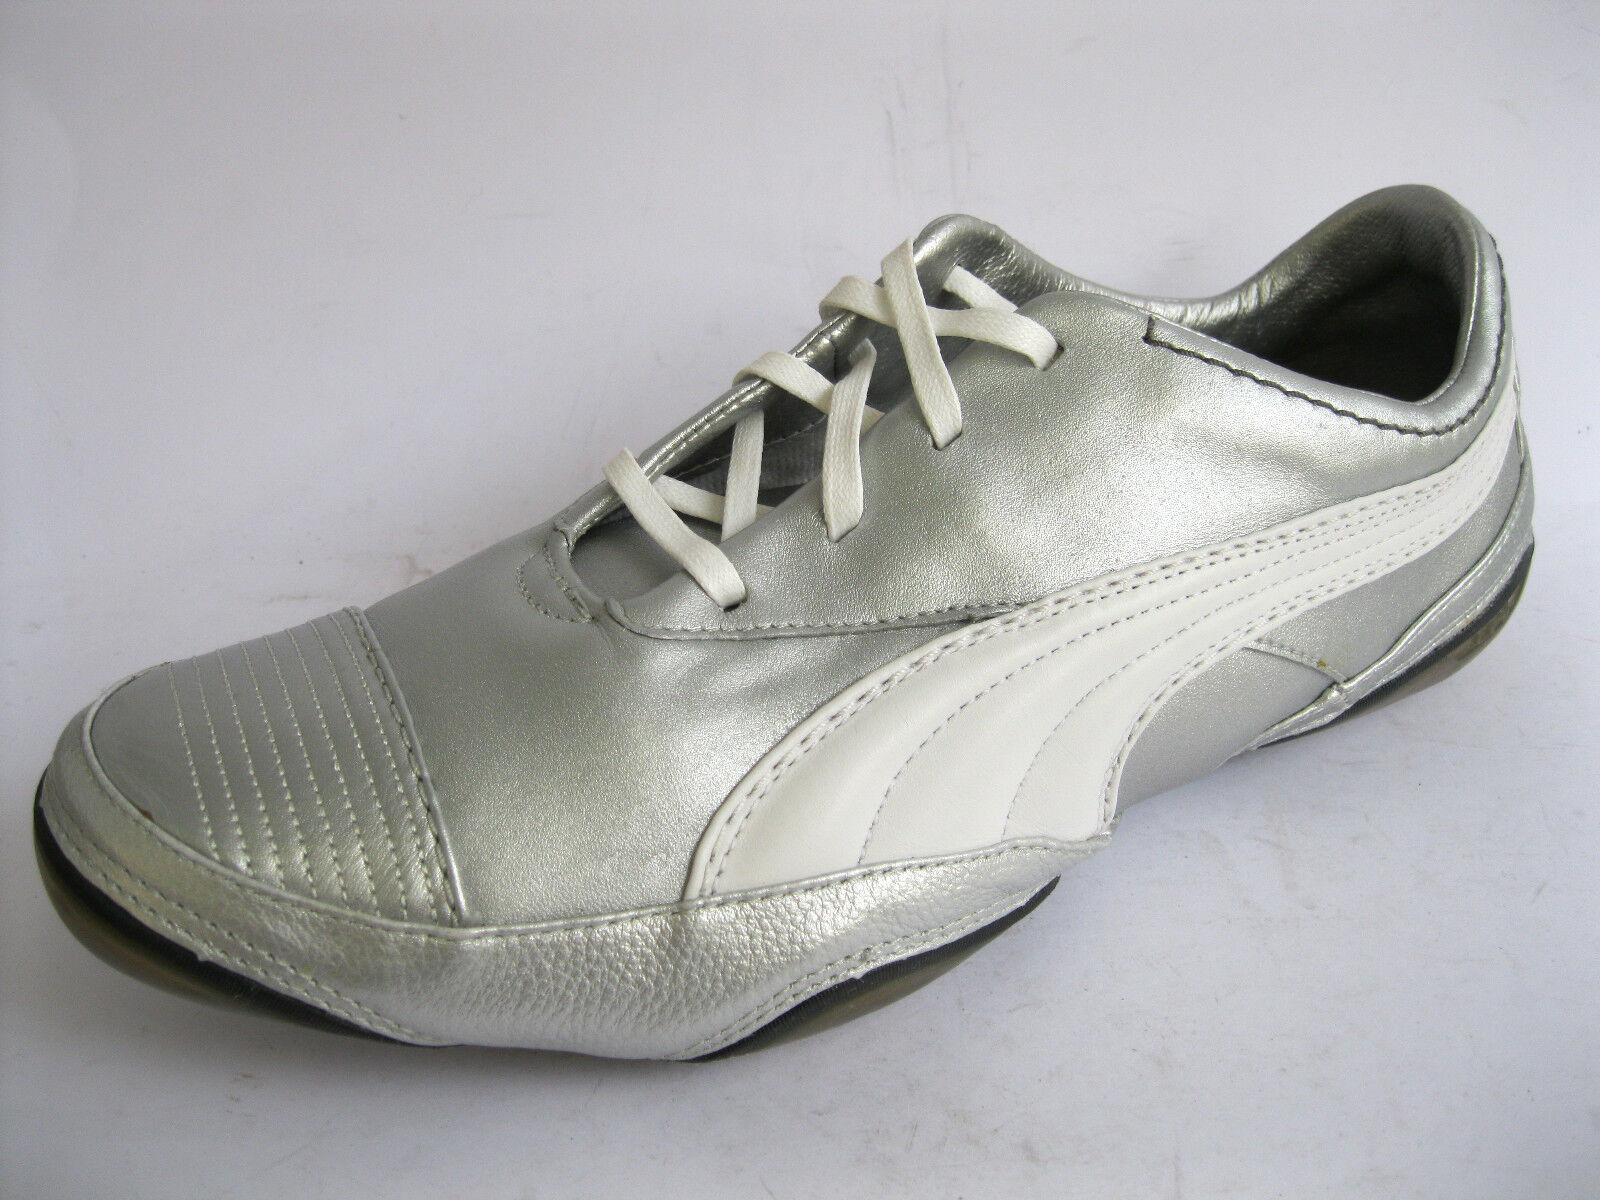 Puma USAN 182962 09 Hombre Plata/Blanco Dark Shadow Shadow Dark Leather Trainers (40A) (Ket) 3891e1